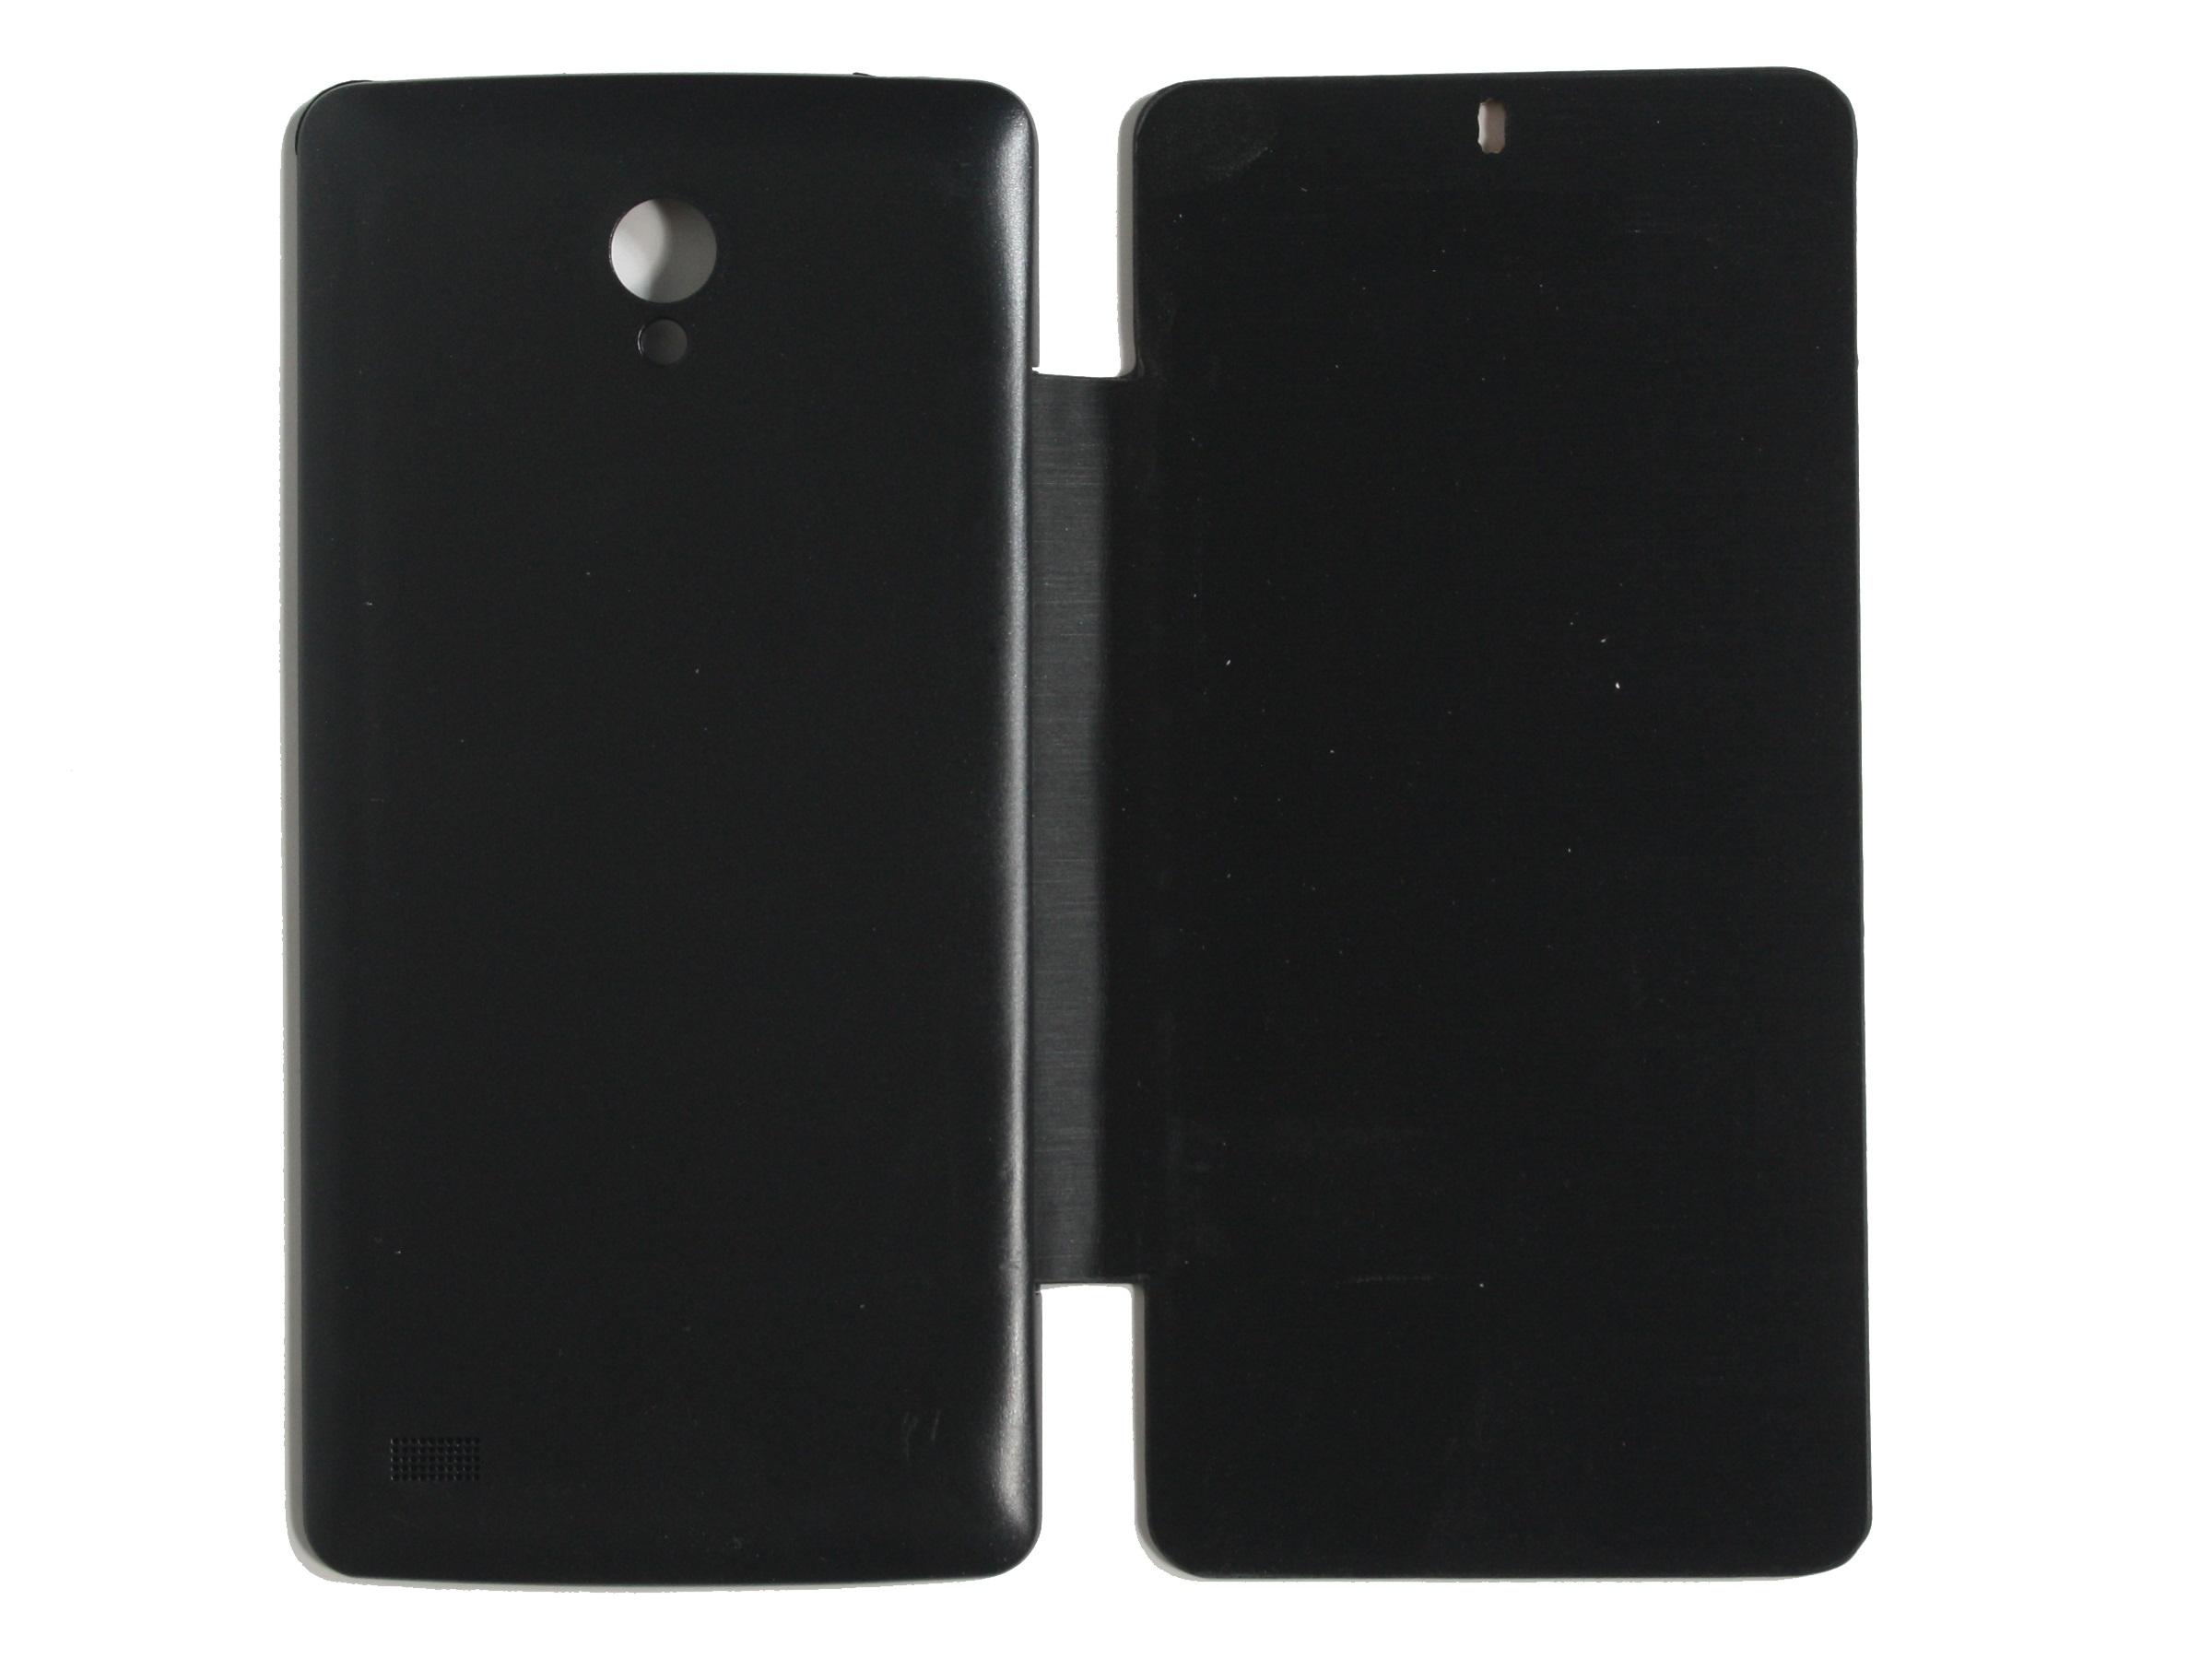 Koloredge Flip Cover For Karbonn S1 Titanium  Black available at ShopClues for Rs.199